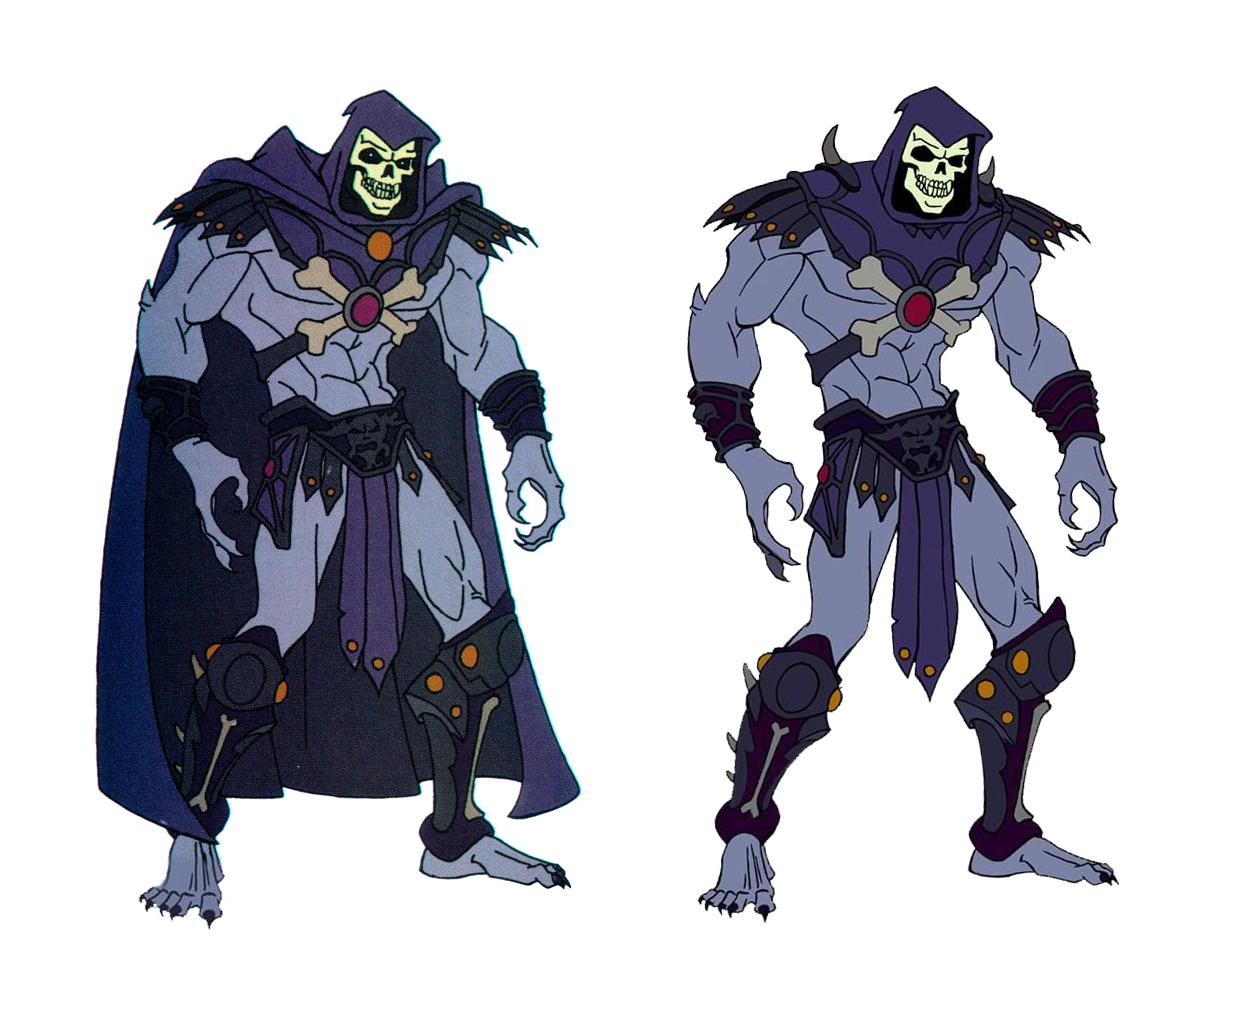 The Essential MYP He-Man: Skeletor's cape